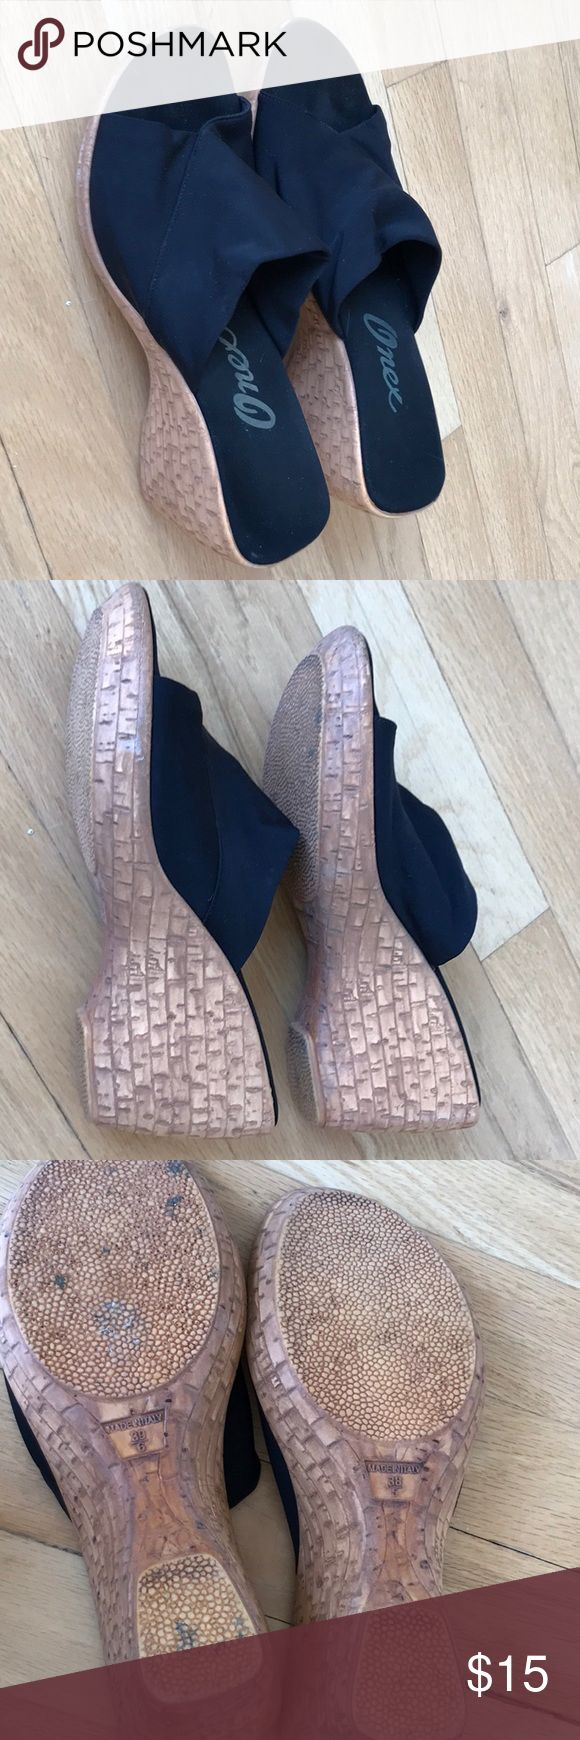 Onex Italian wedges size 9. Neoprene comfort. Onex Italian made neoprene fabric for extra comfort. Size 9 Onex Shoes